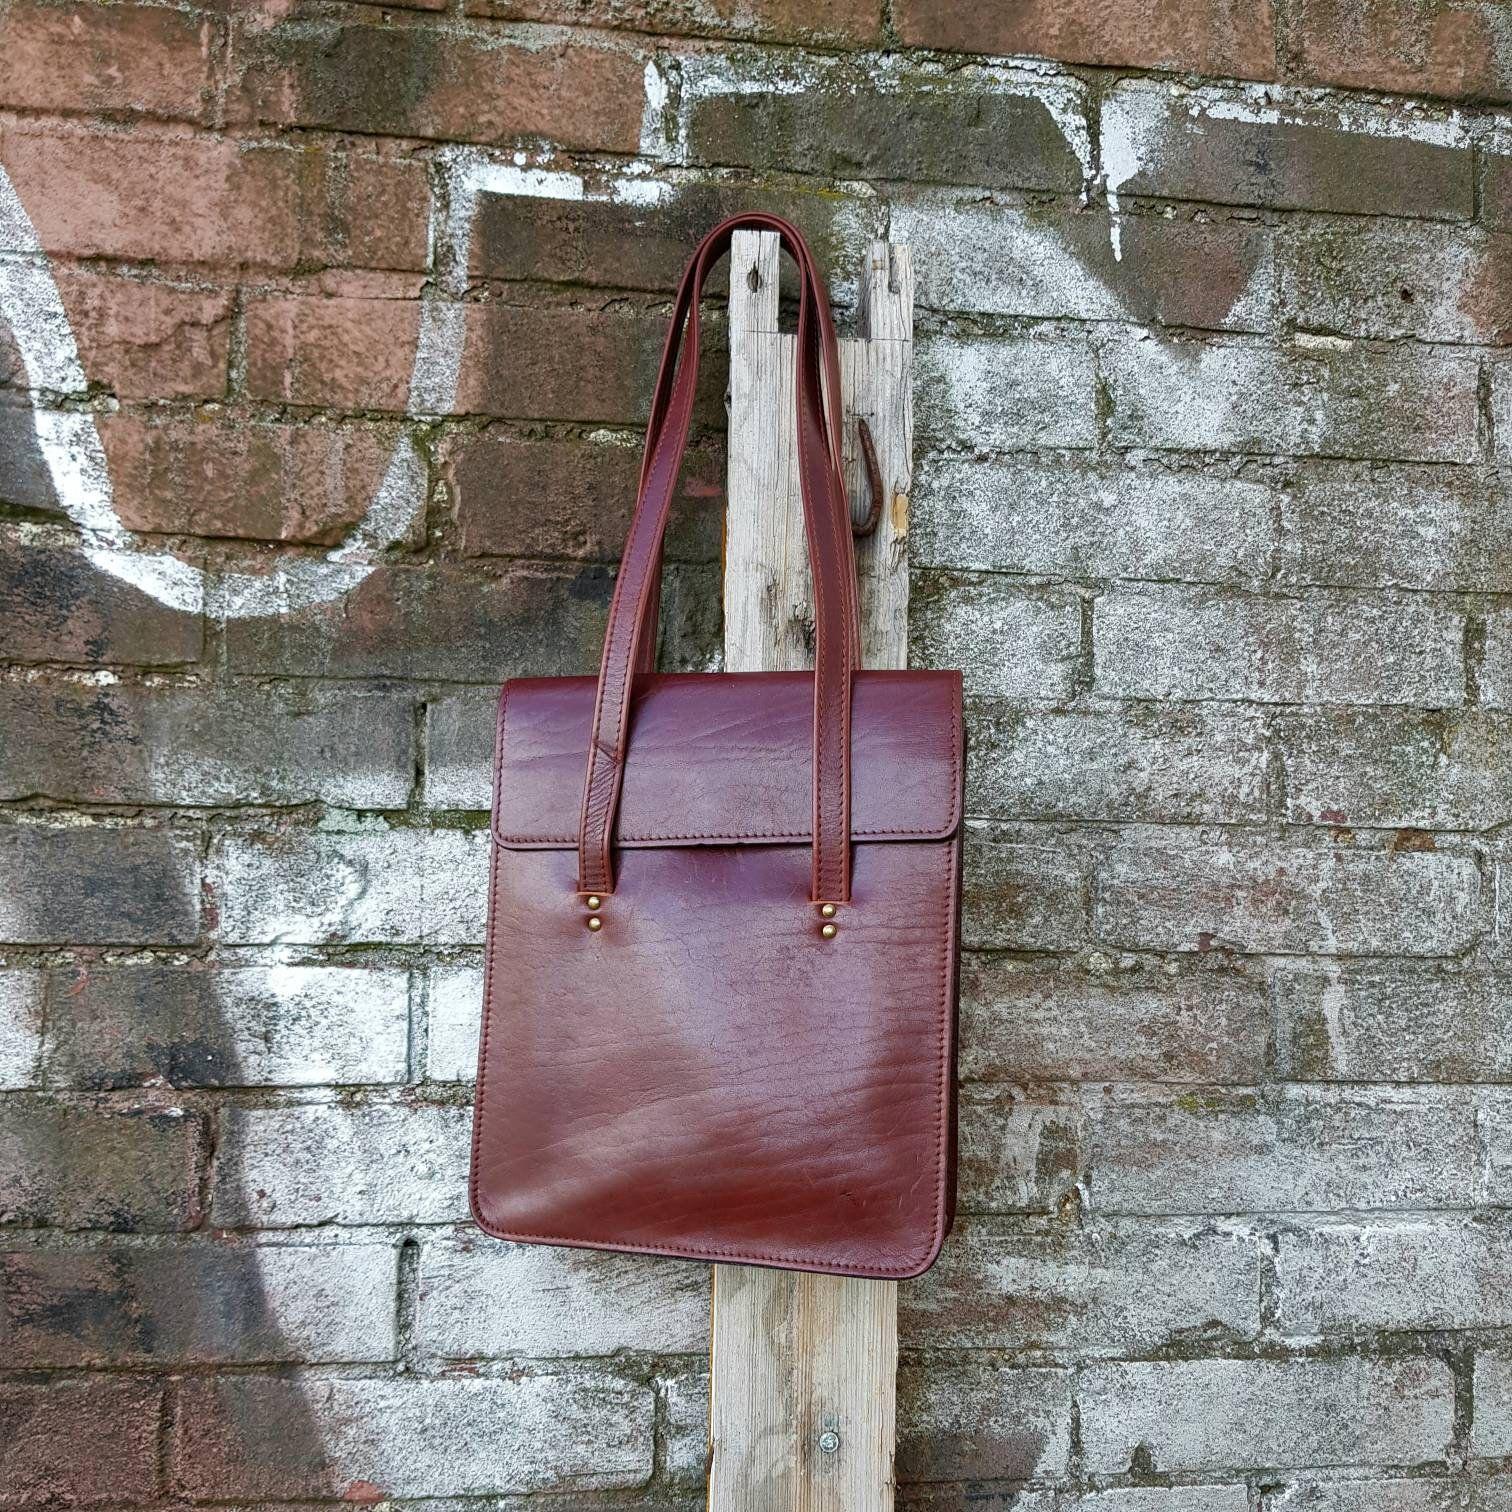 TAUPE Genuine leather woman handbag shoulder bag embossed lizard.Made in Italy